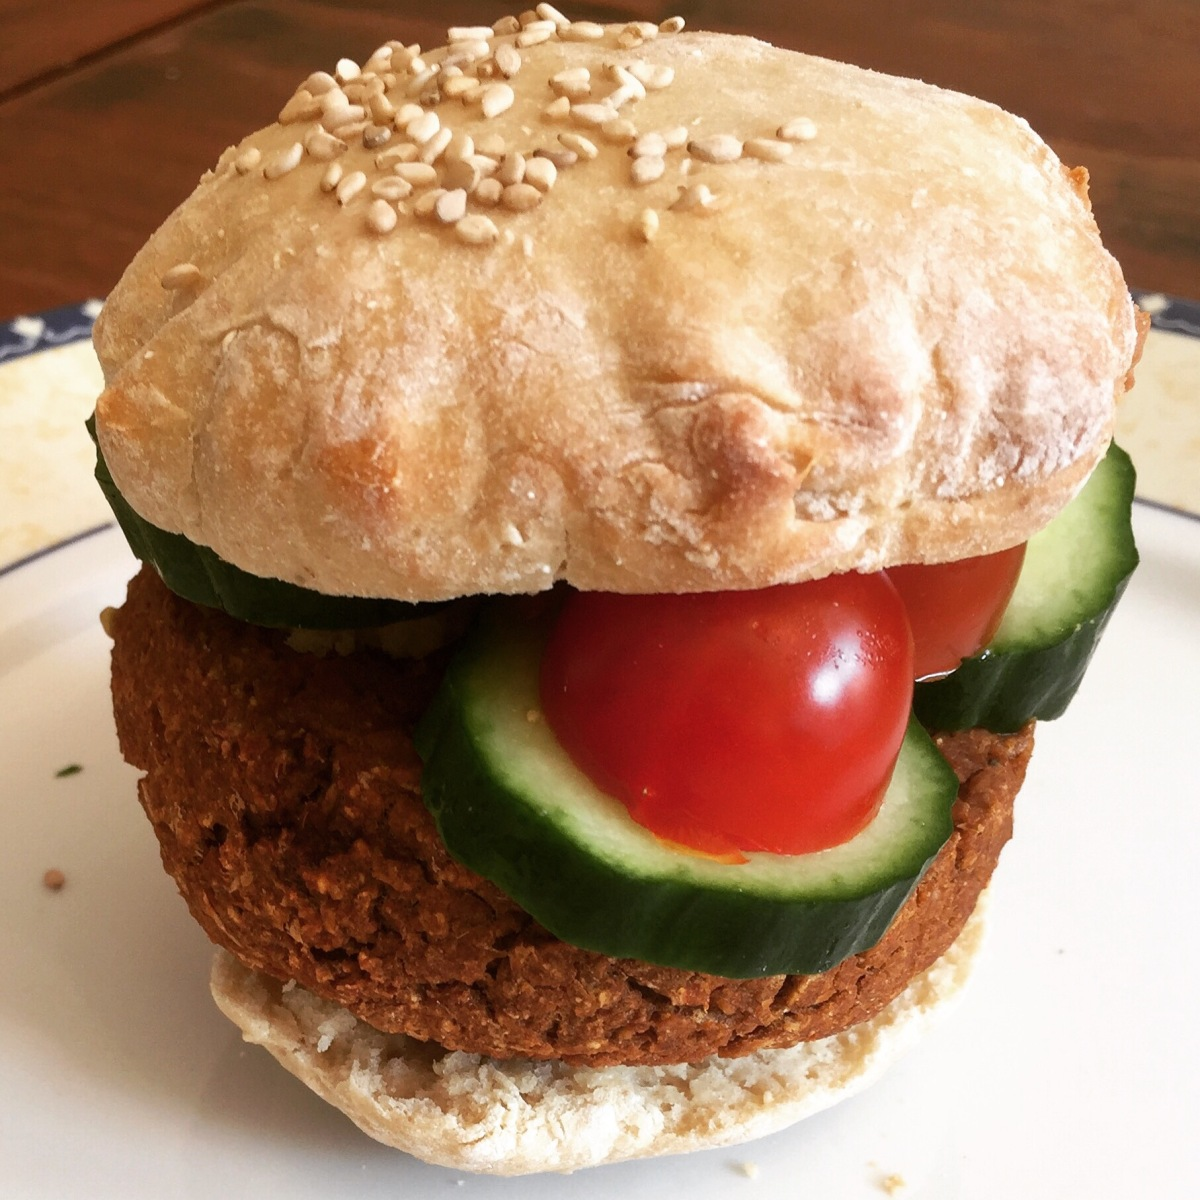 Simpele Vegan Burger of gehaktballetjes